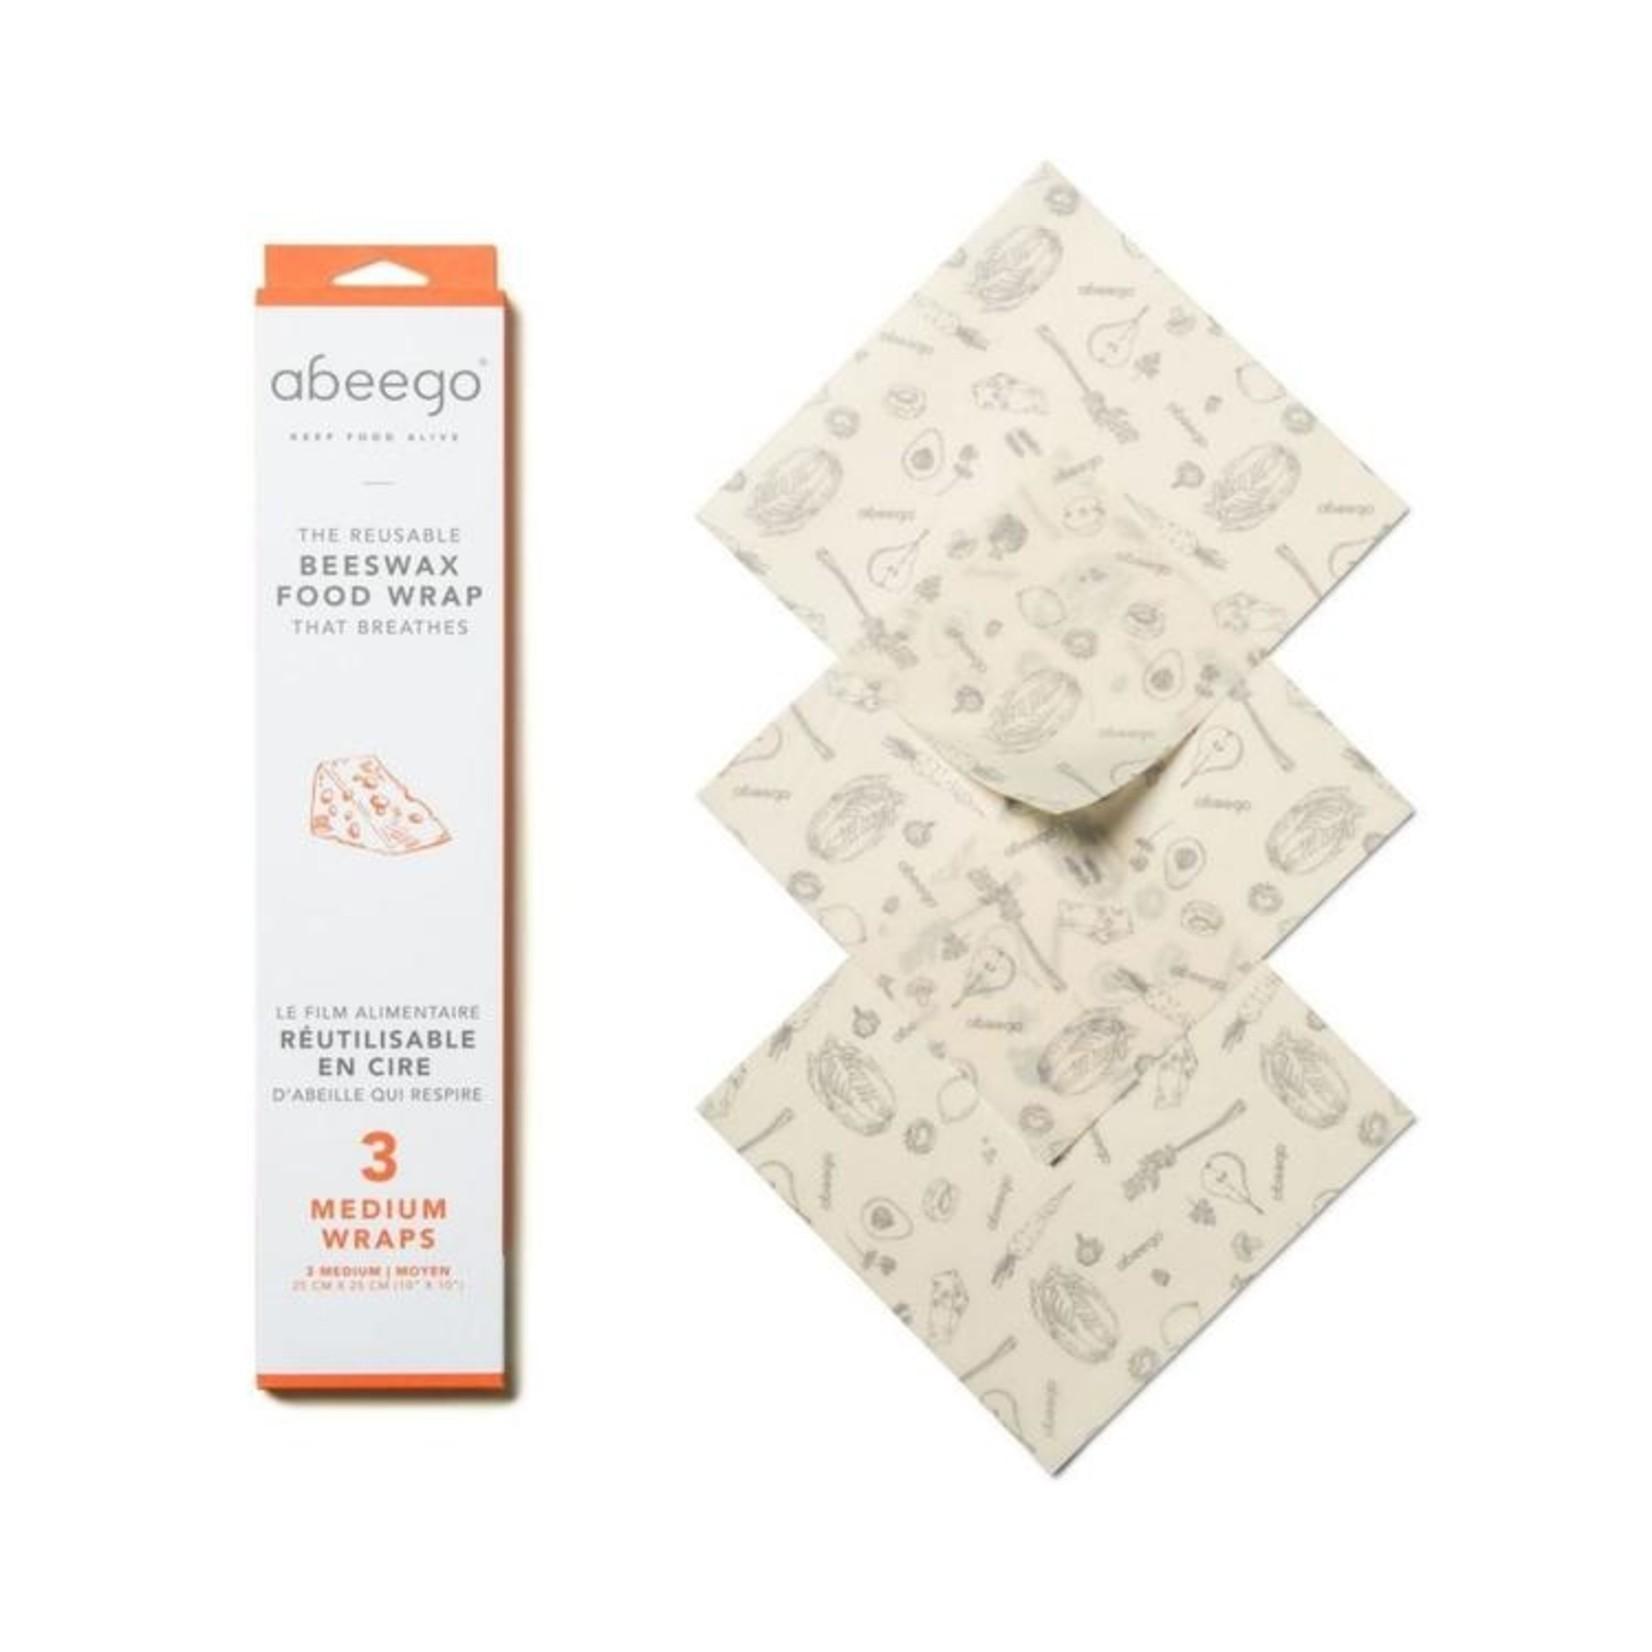 Abeego Reusable Beeswax Food Wrap